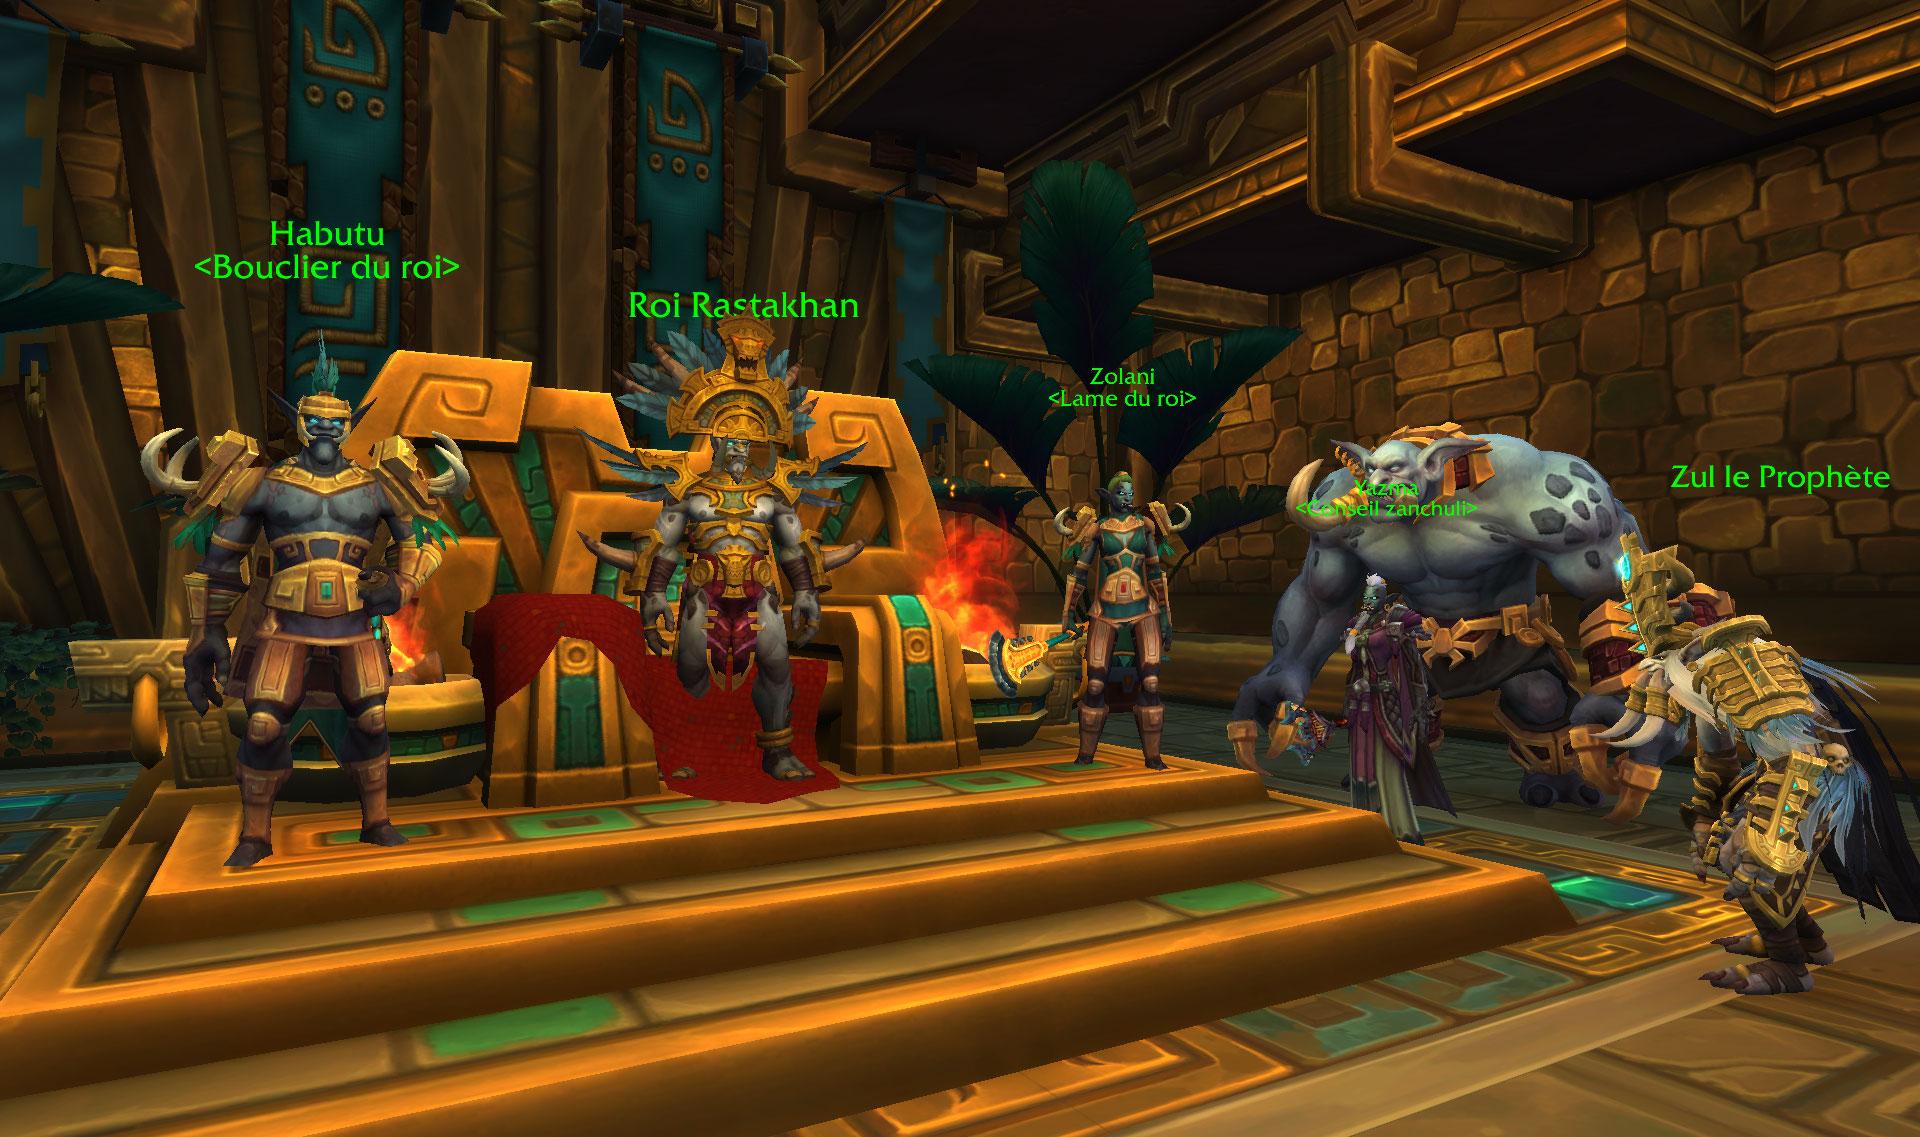 Screenshot de la région de Zuldazar dans World of Warcraft: Battle for Azeroth.